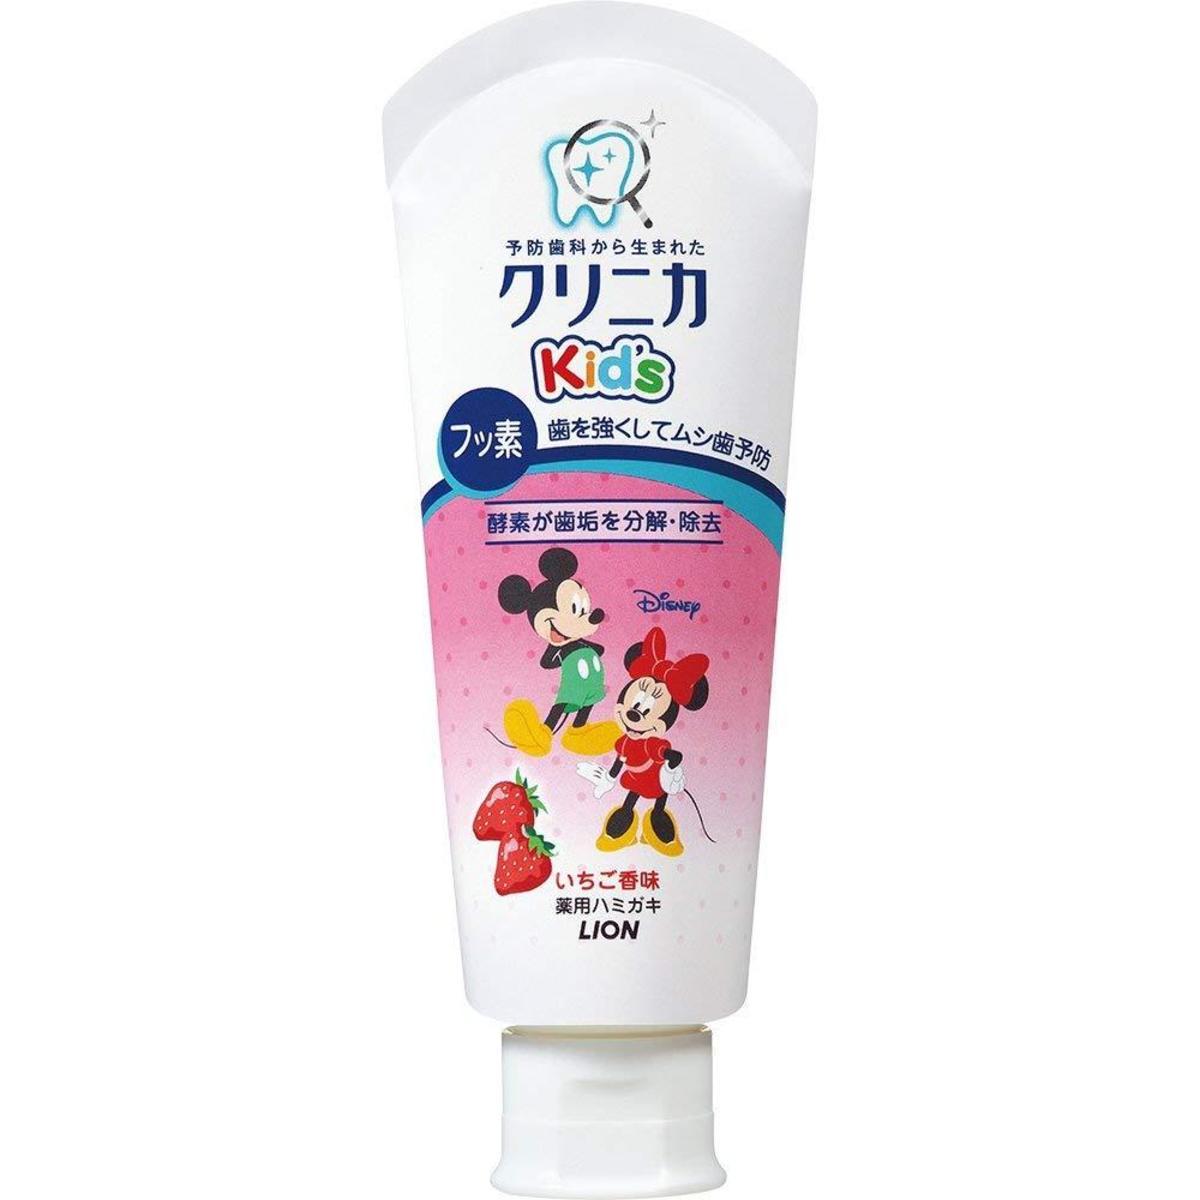 Mickey Kid's 學齡款兒童牙膏 (6-12歲適用) 60g  草莓味